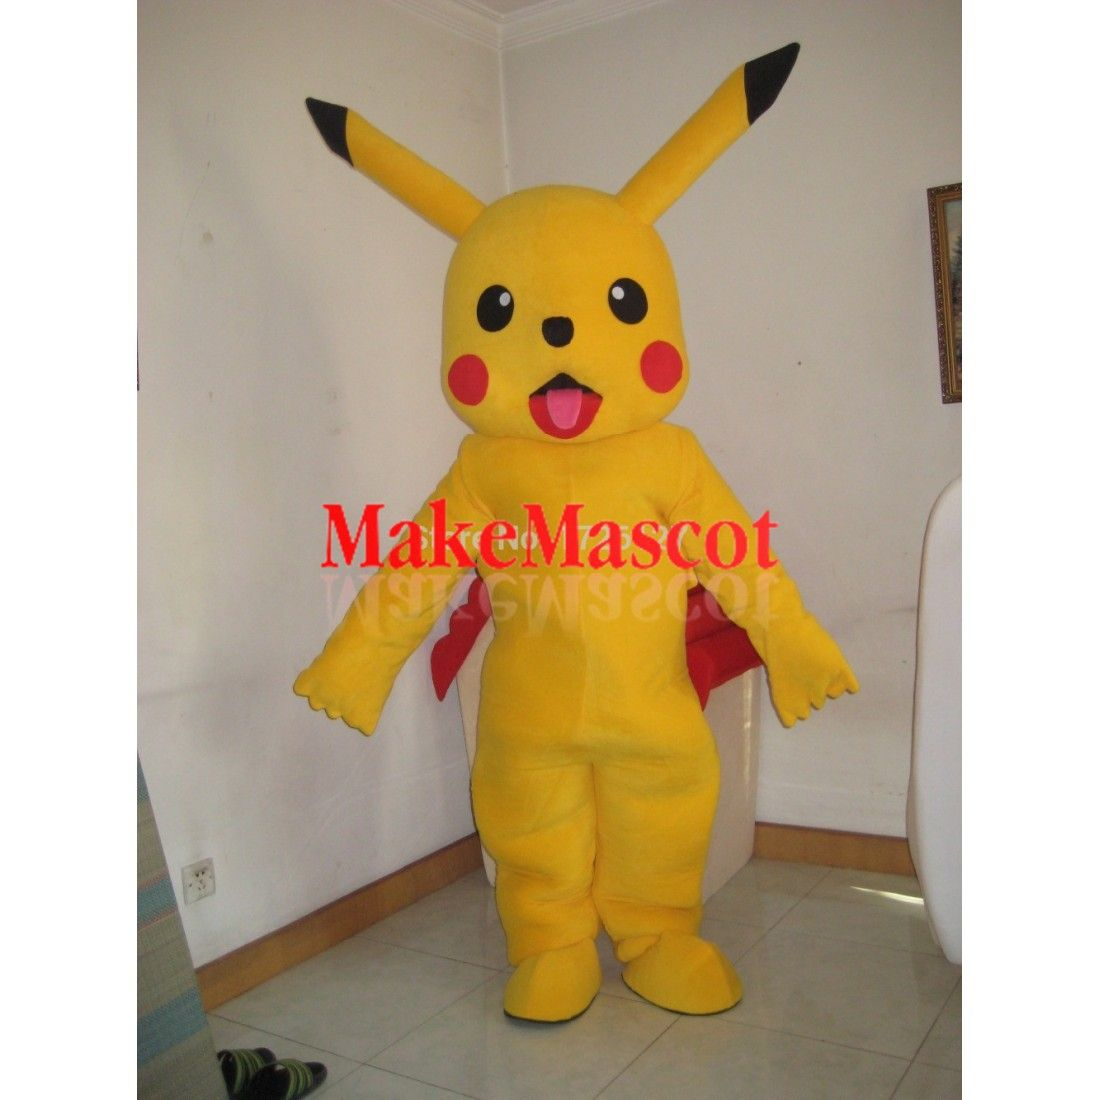 Mascot Pikachu Cartoon Mascot Costume Custom Fancy Costume Anime Cosplay Character Mascotte Theme Fancy Dress Carnival Costume Cartoon Mascot Costumes Mascot Mascot Costumes